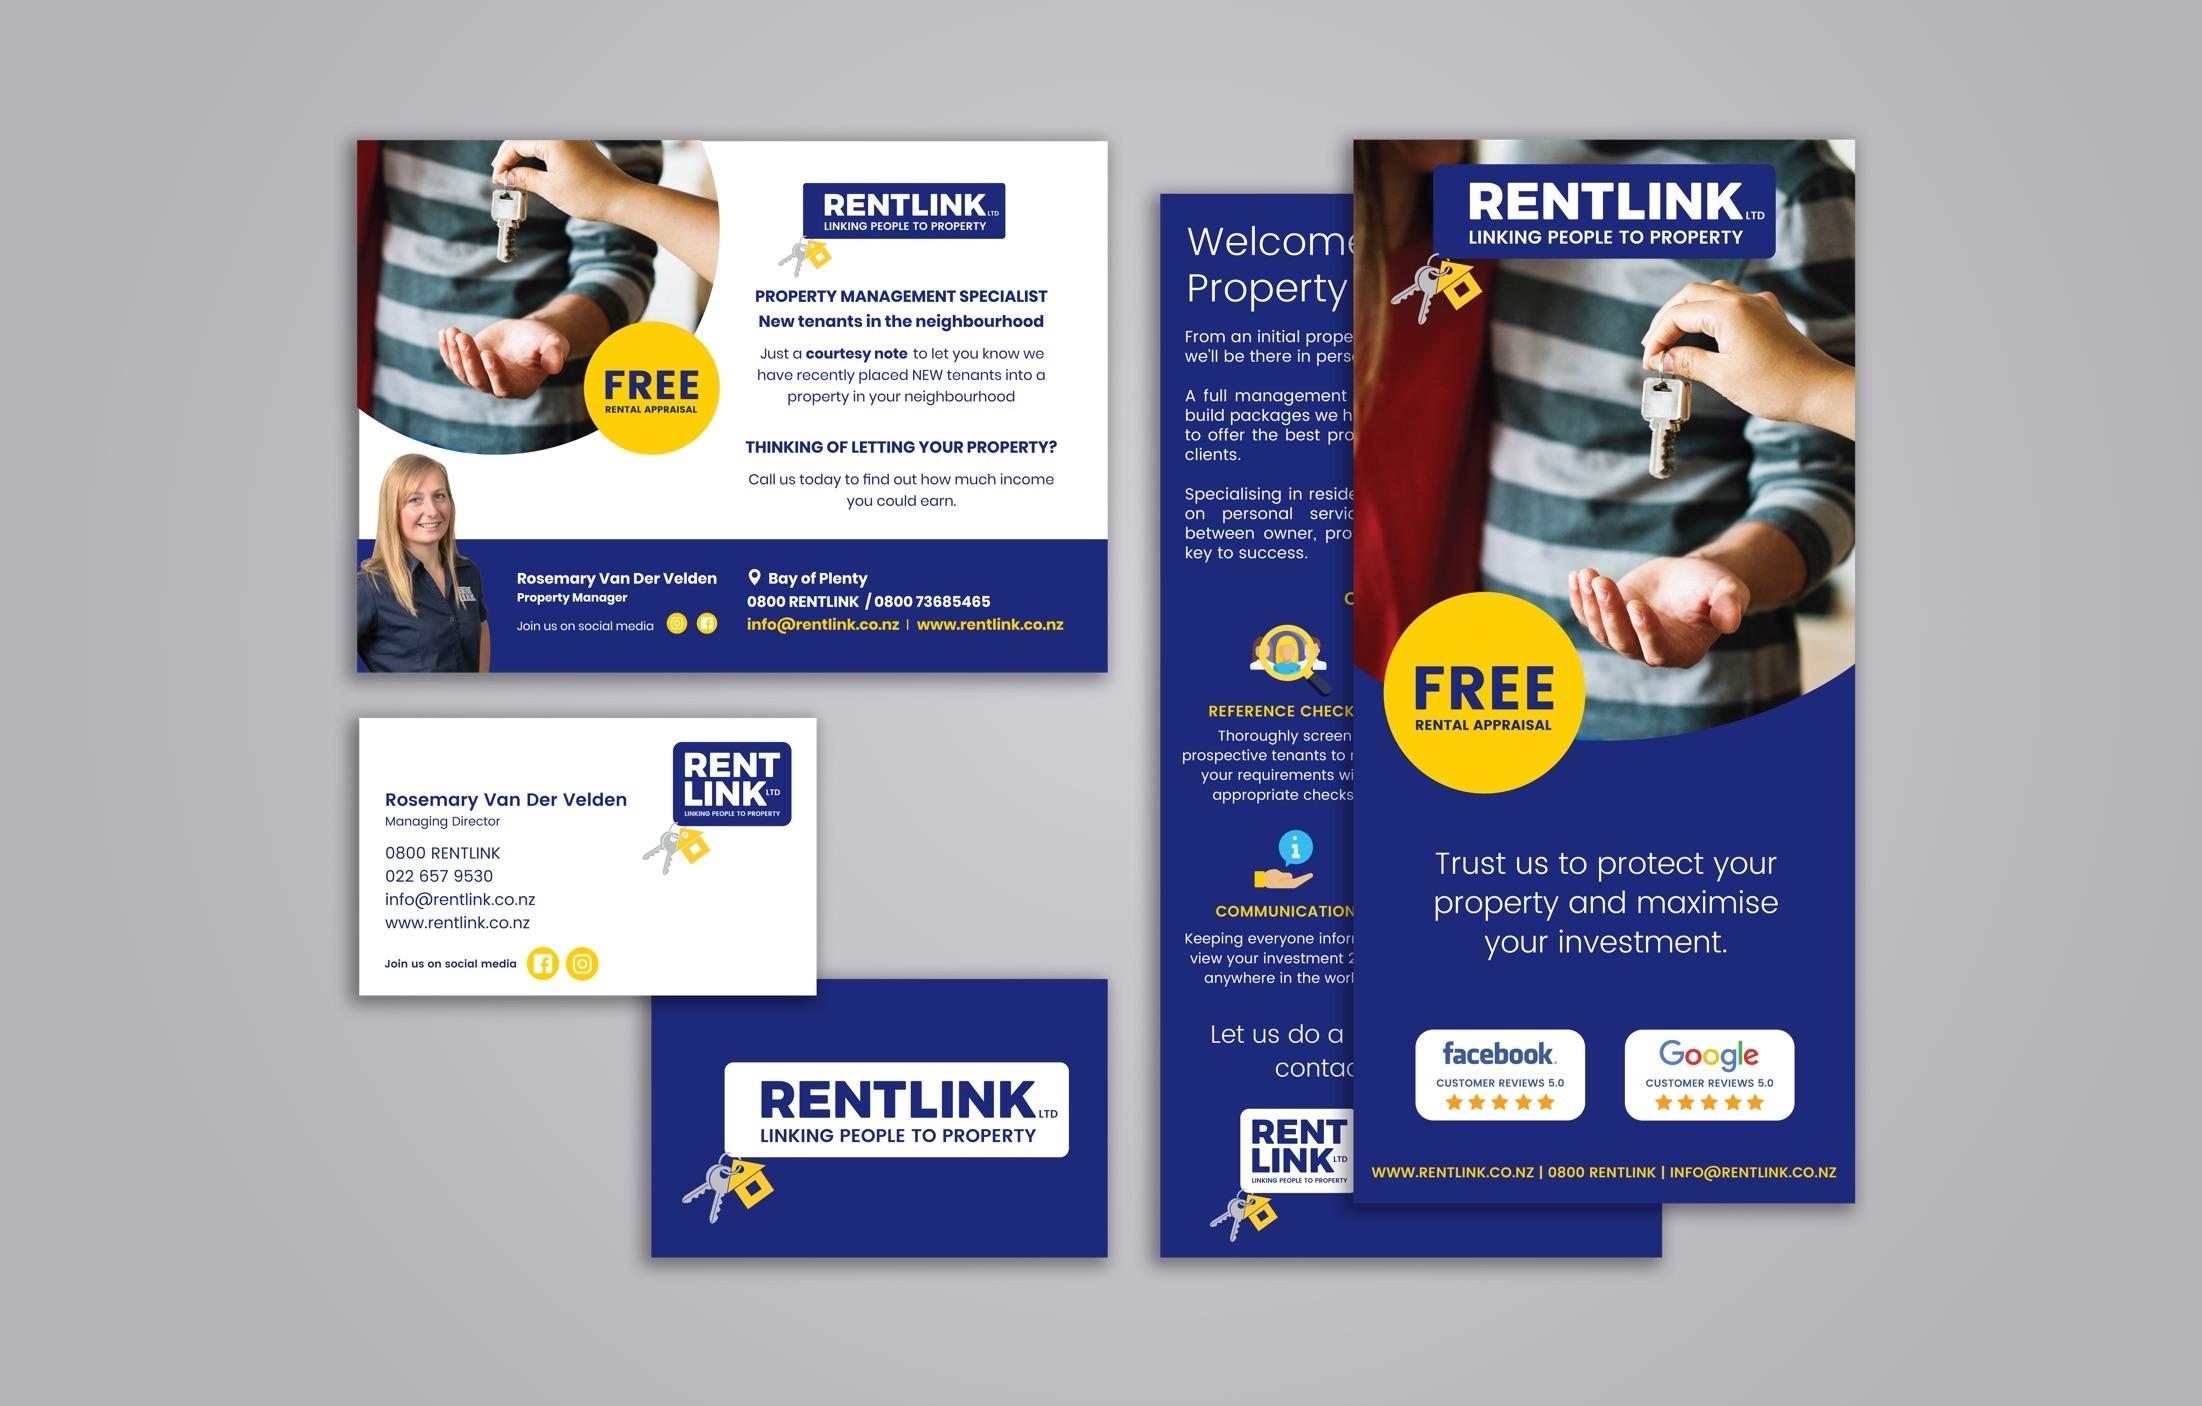 Print Material - Rentlink